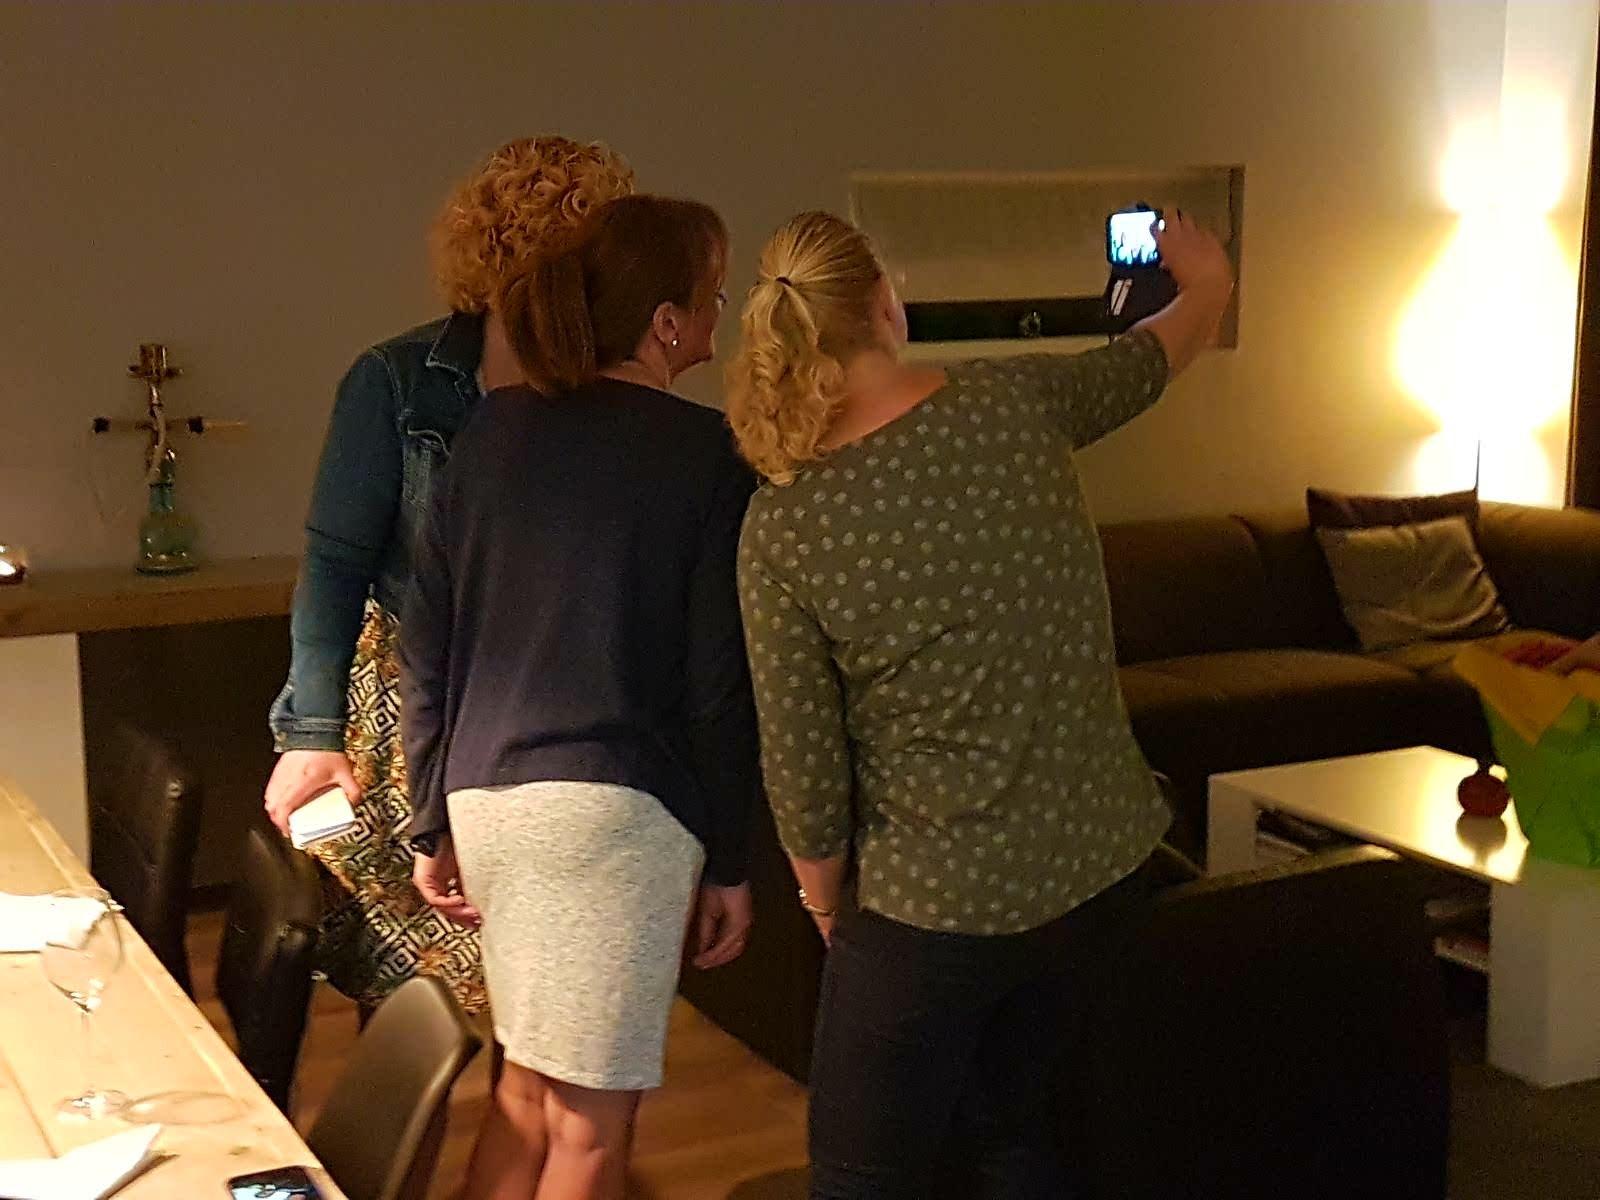 Foodbloggers selfie